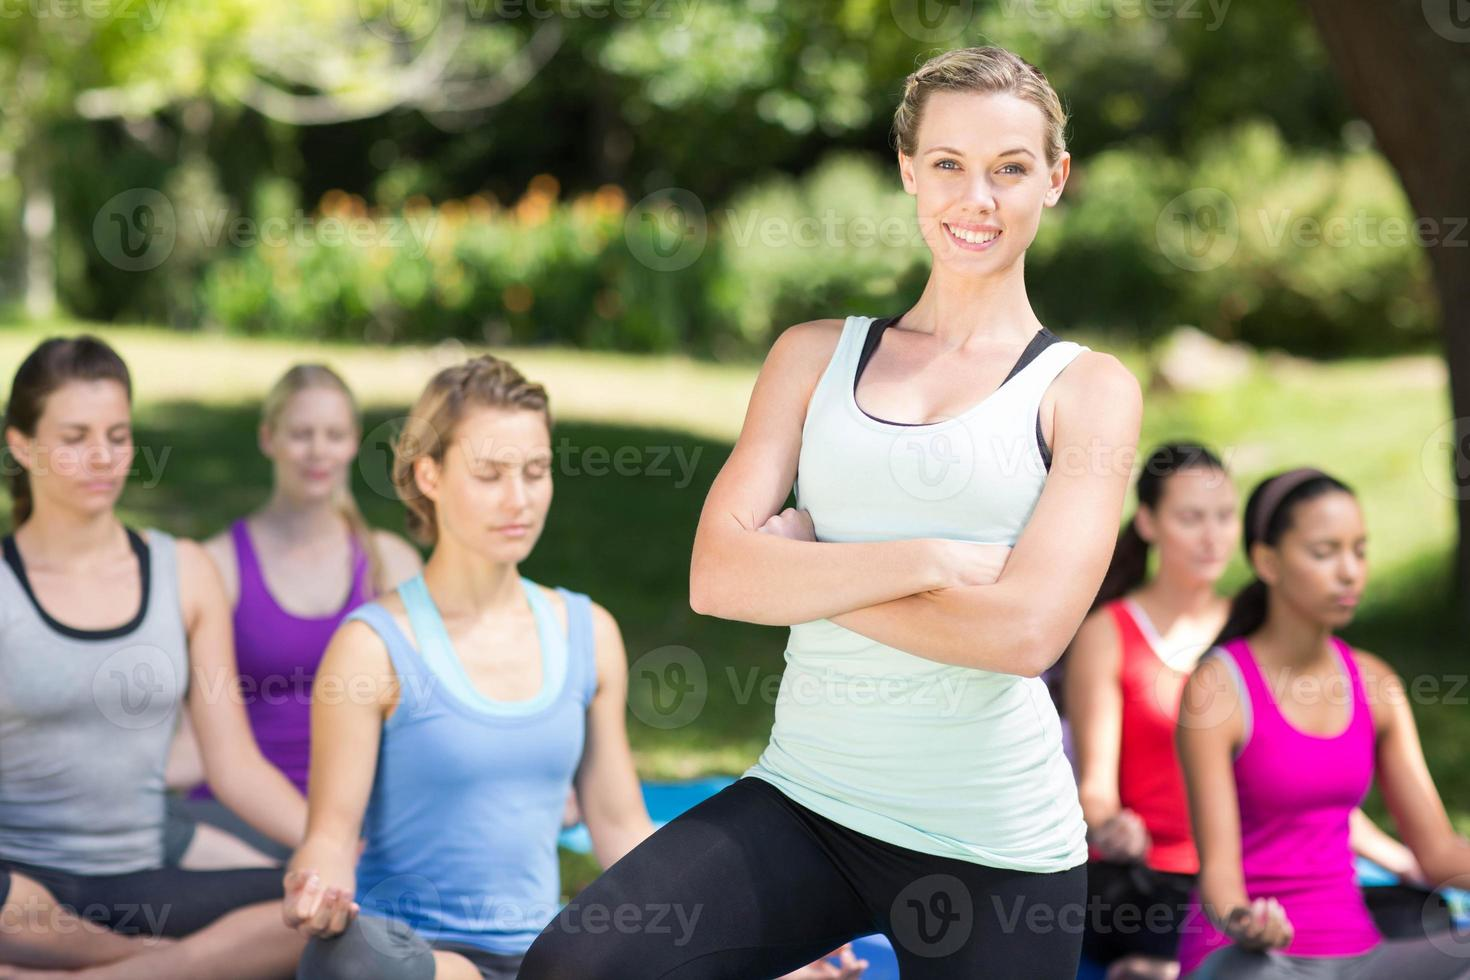 Fitnessgruppe macht Yoga im Park foto